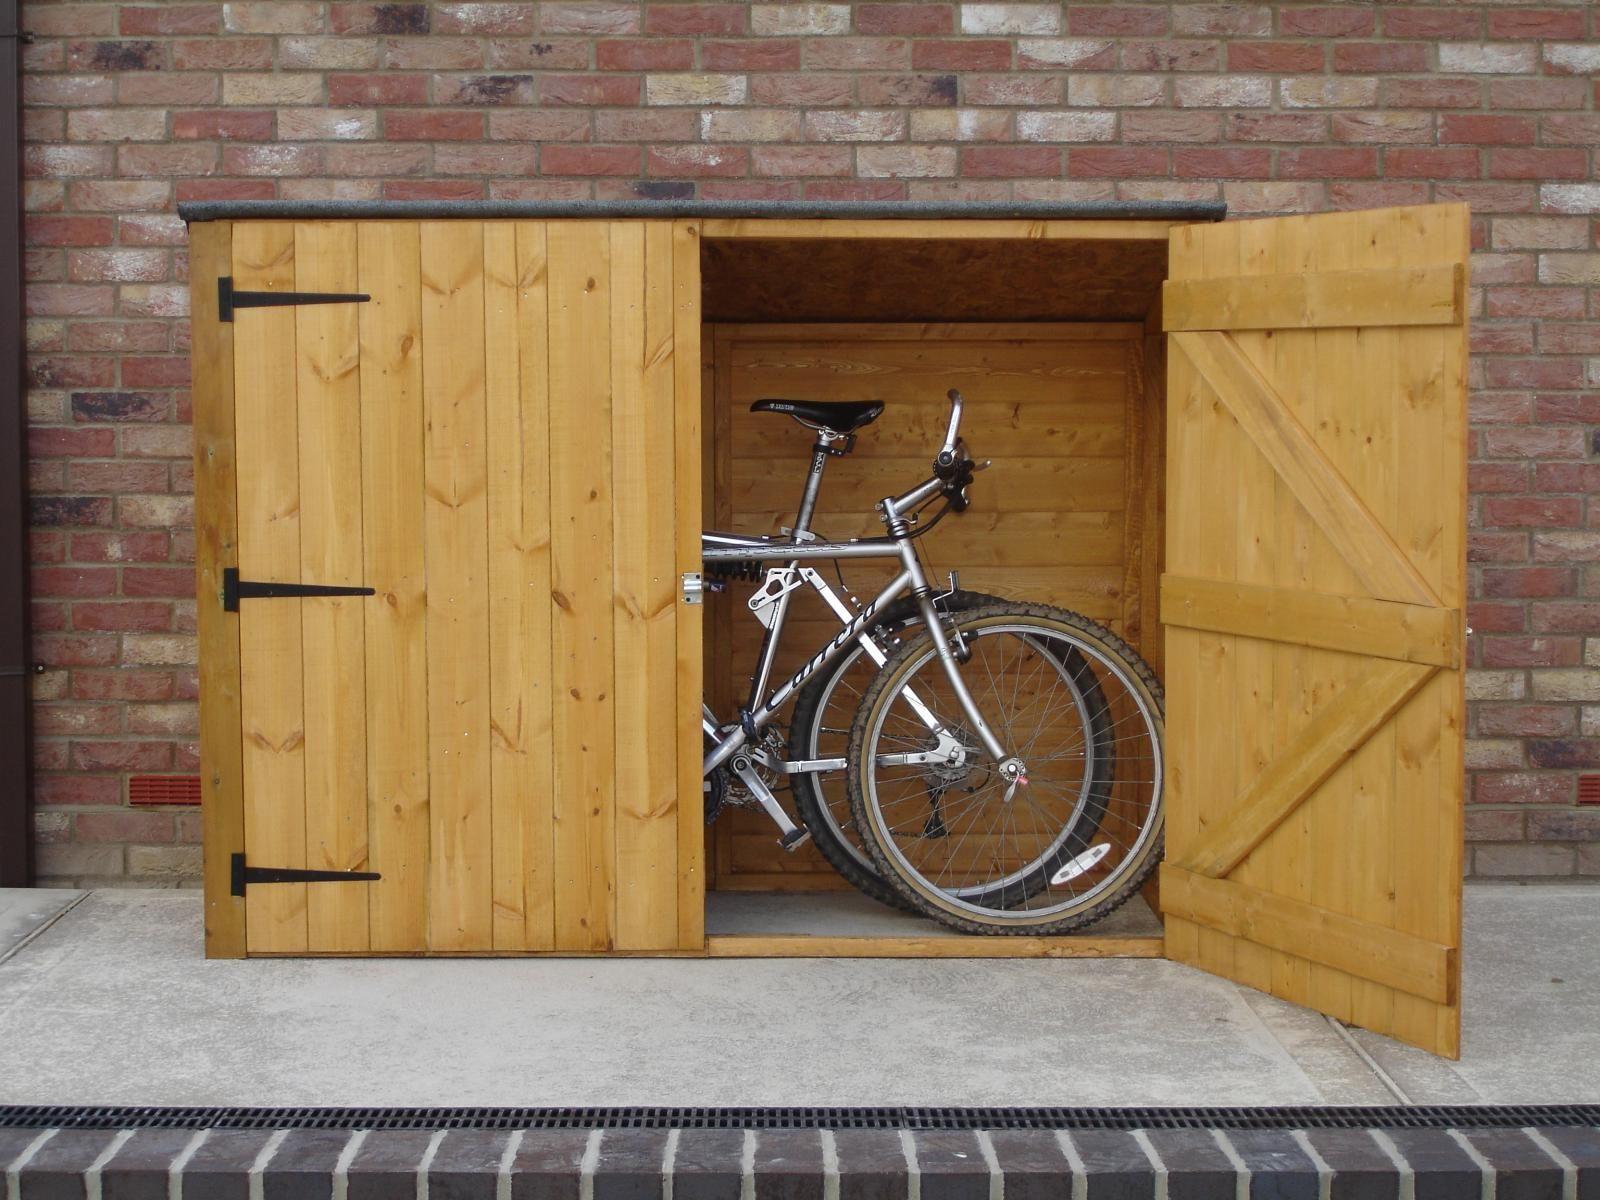 bike shed Bike Store 1850 x 690 Sheds Bicycle